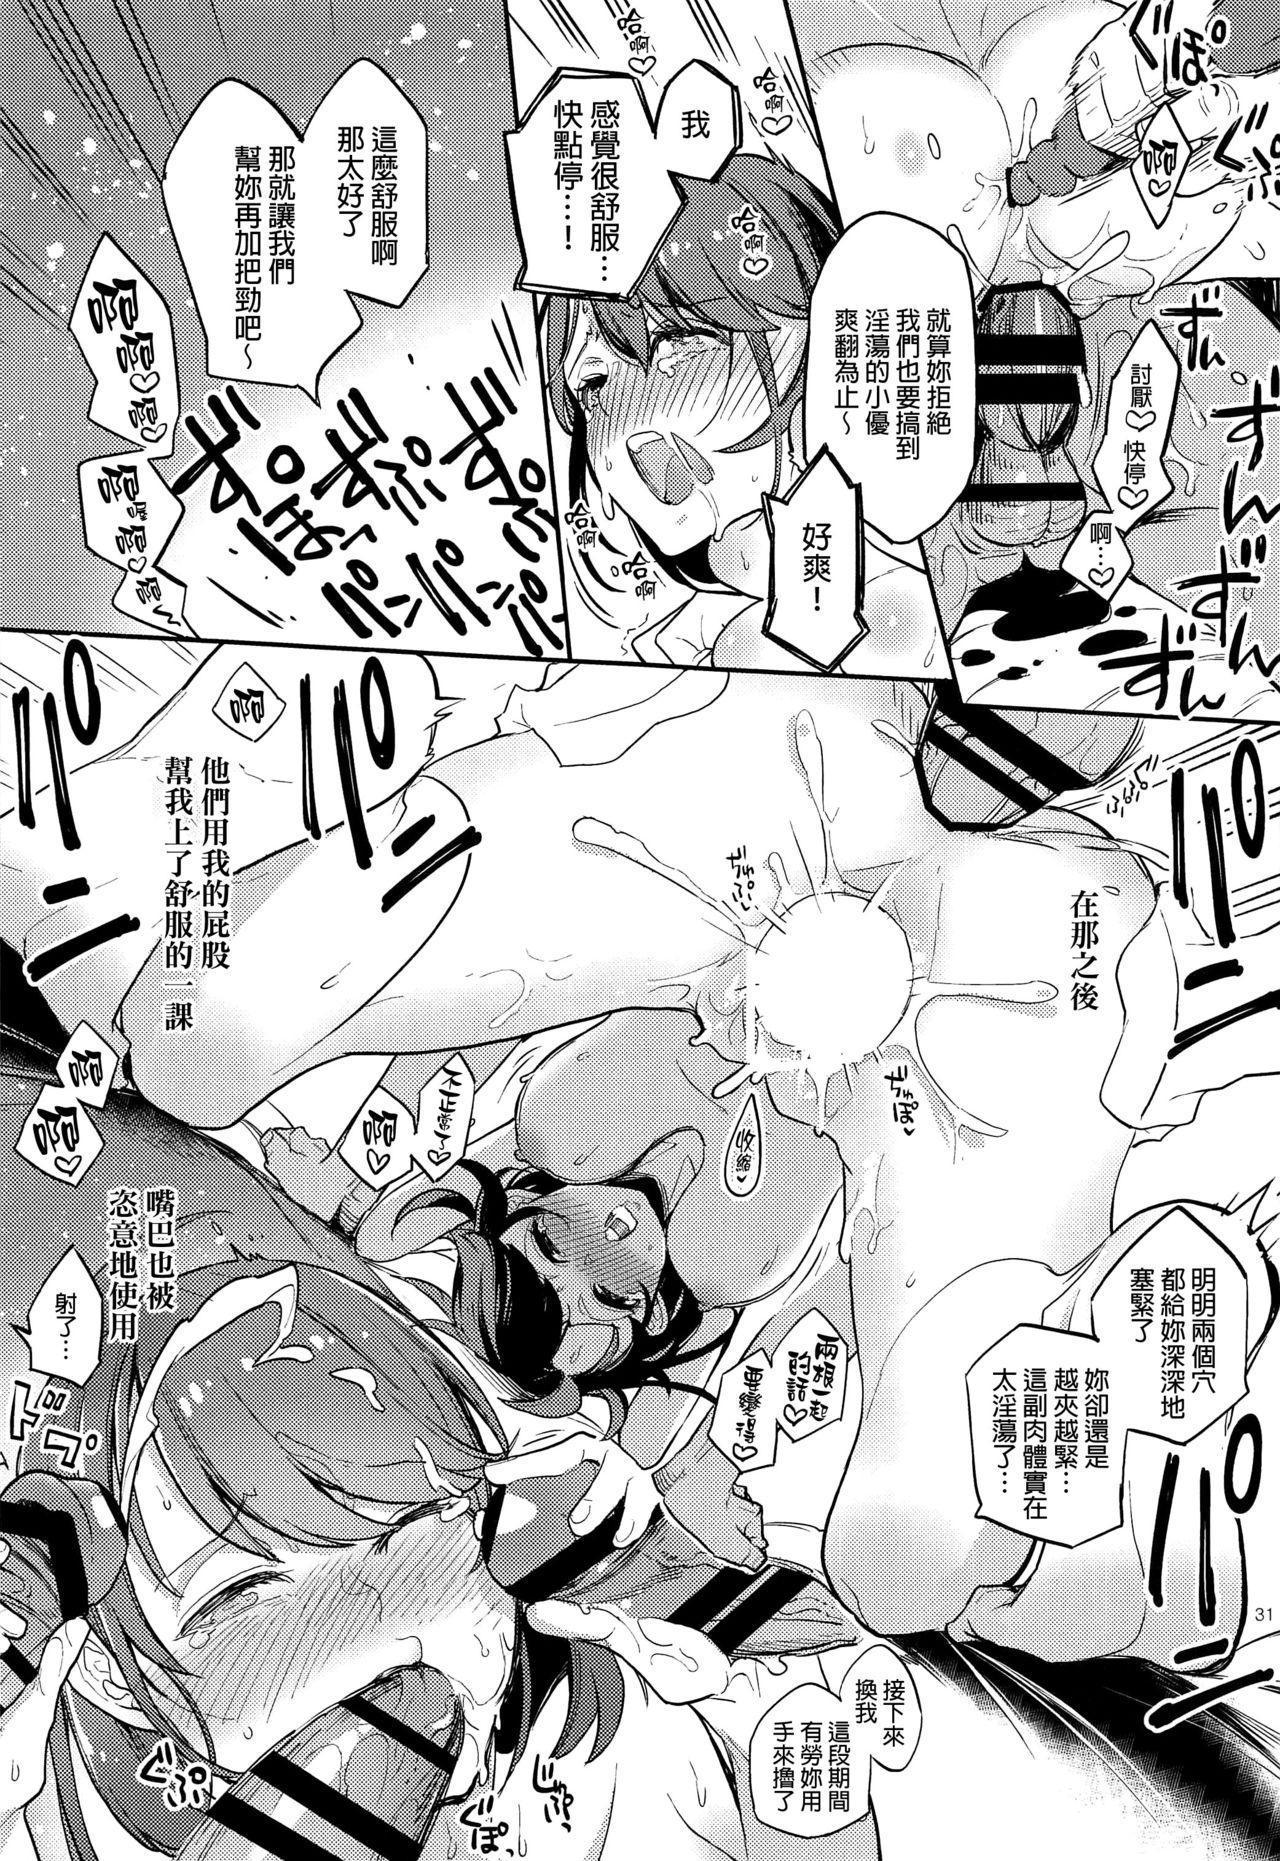 Kibana-san Gomennasai 29